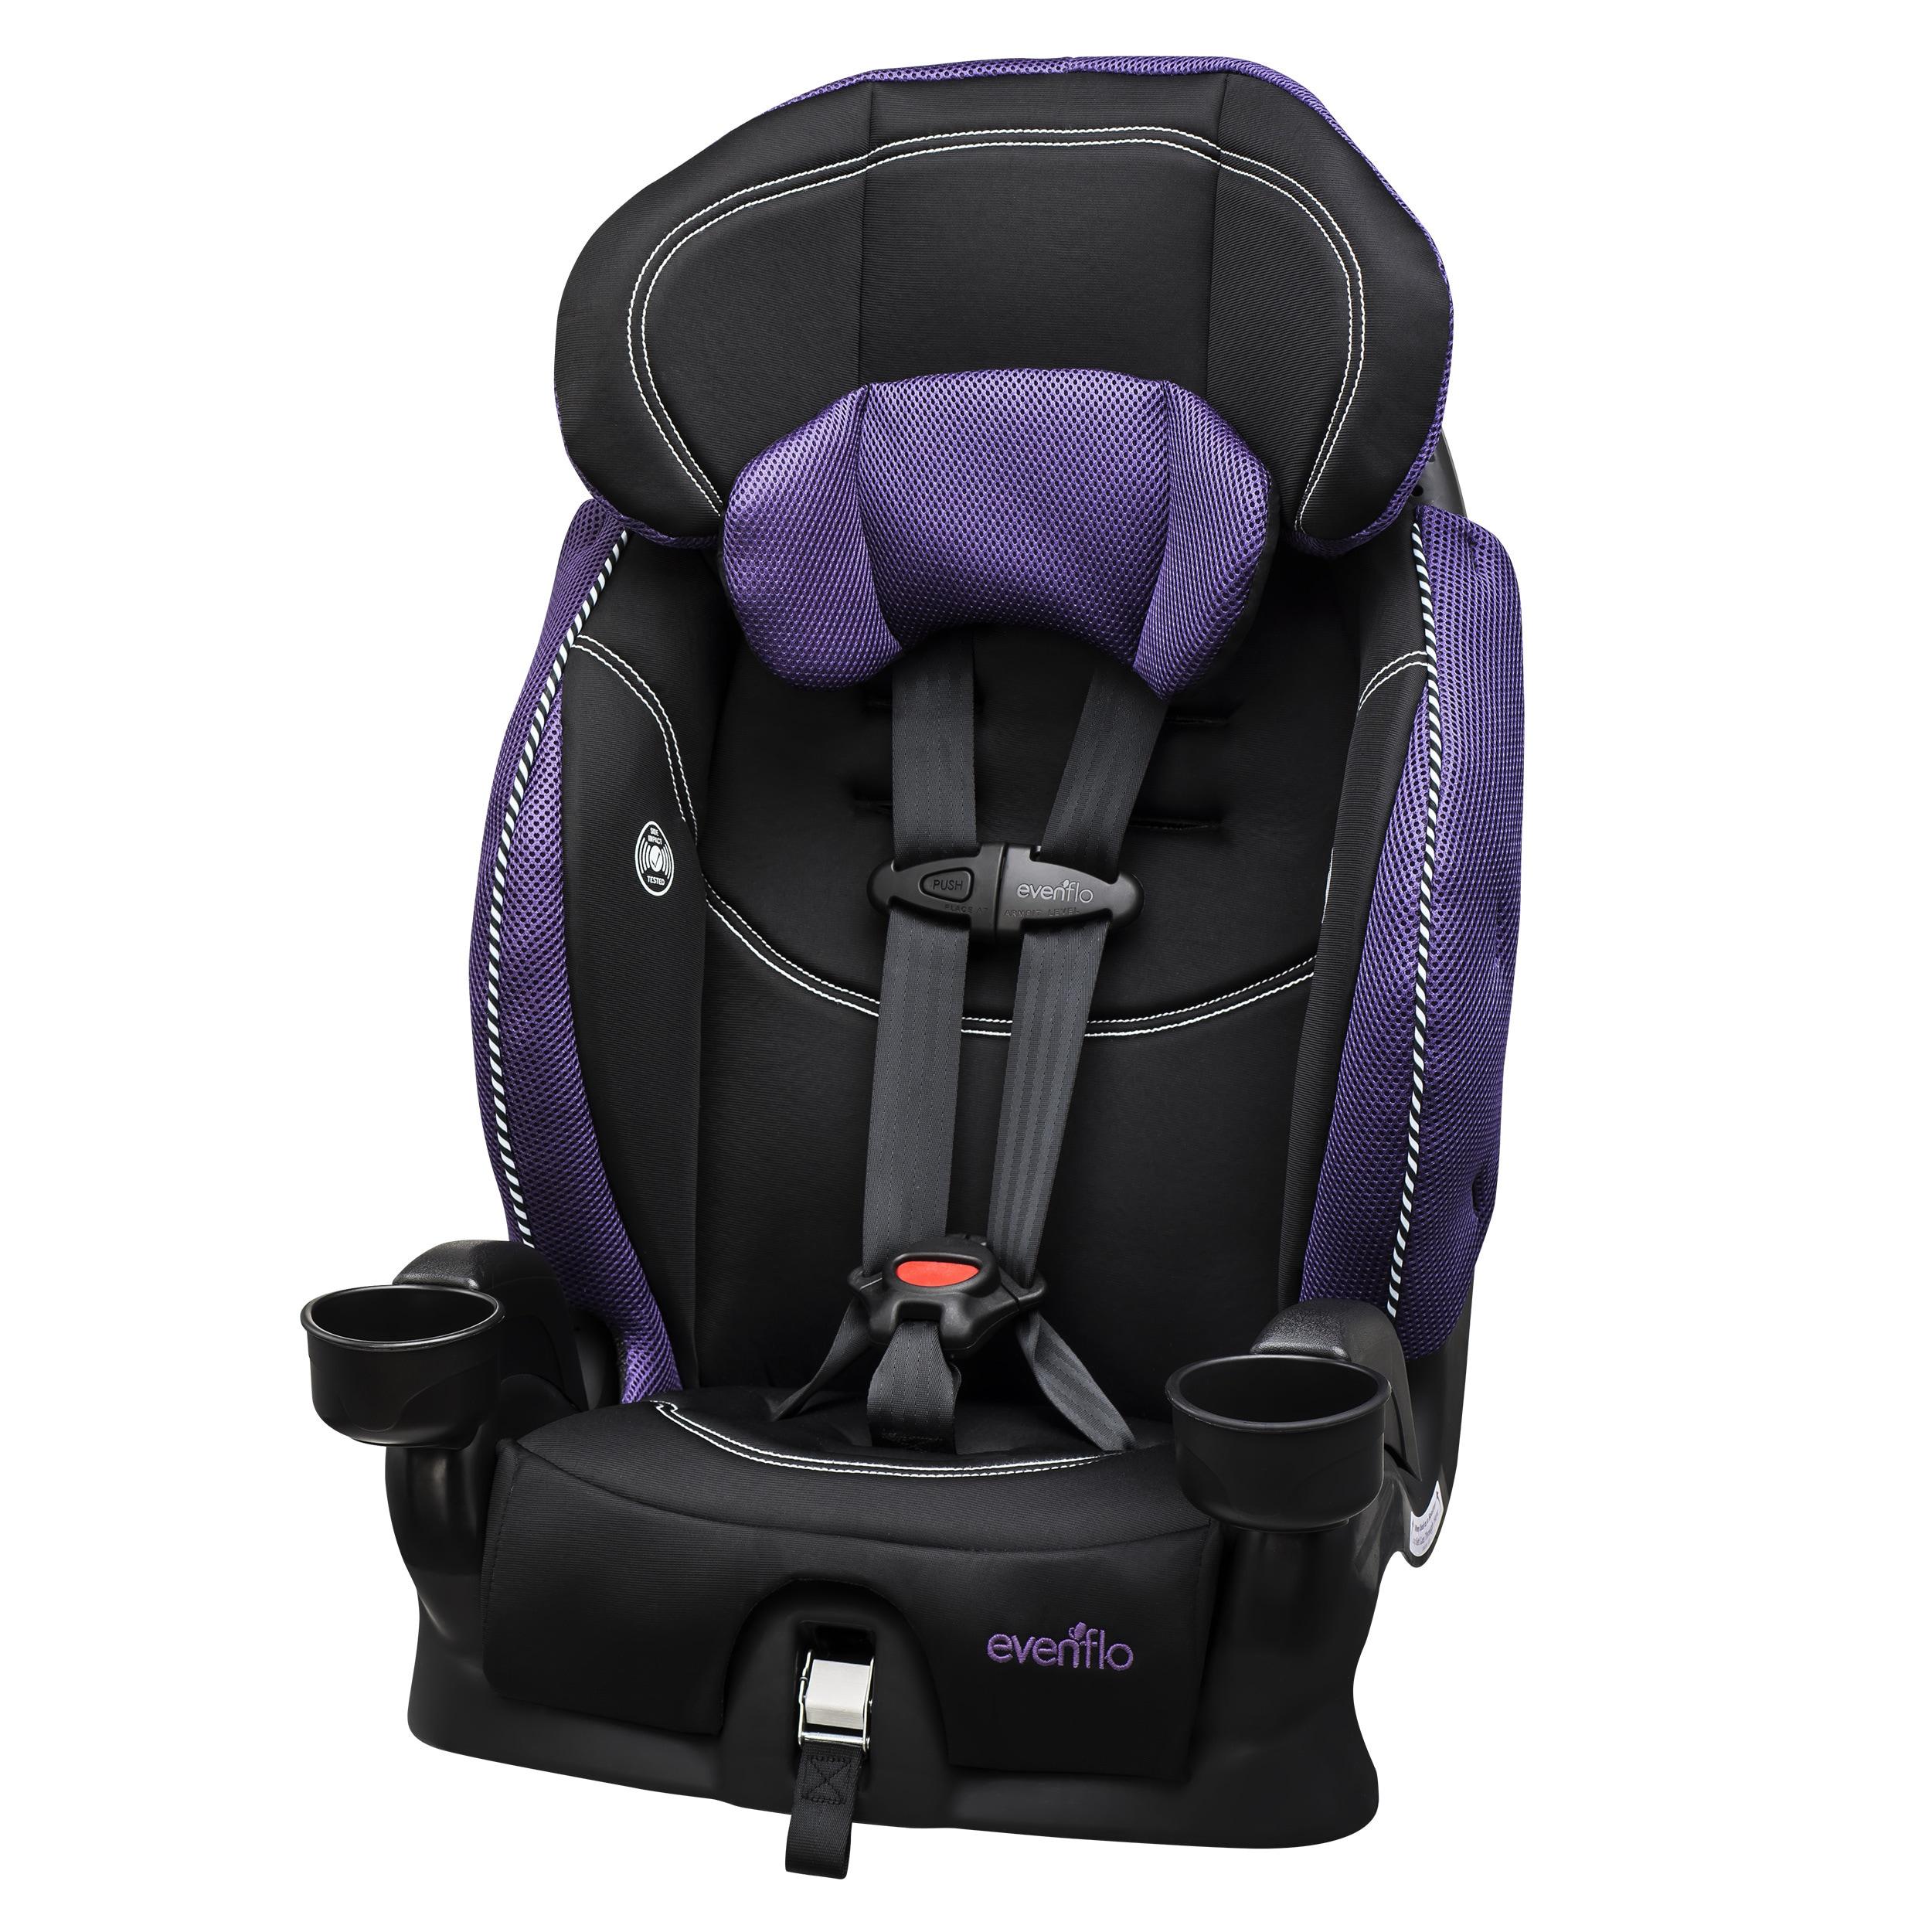 24d0ad60e63 Evenflo snugli baby carrier backpack cross country hiking dream jpg  2500x2500 Snugli baby carrier for hiking